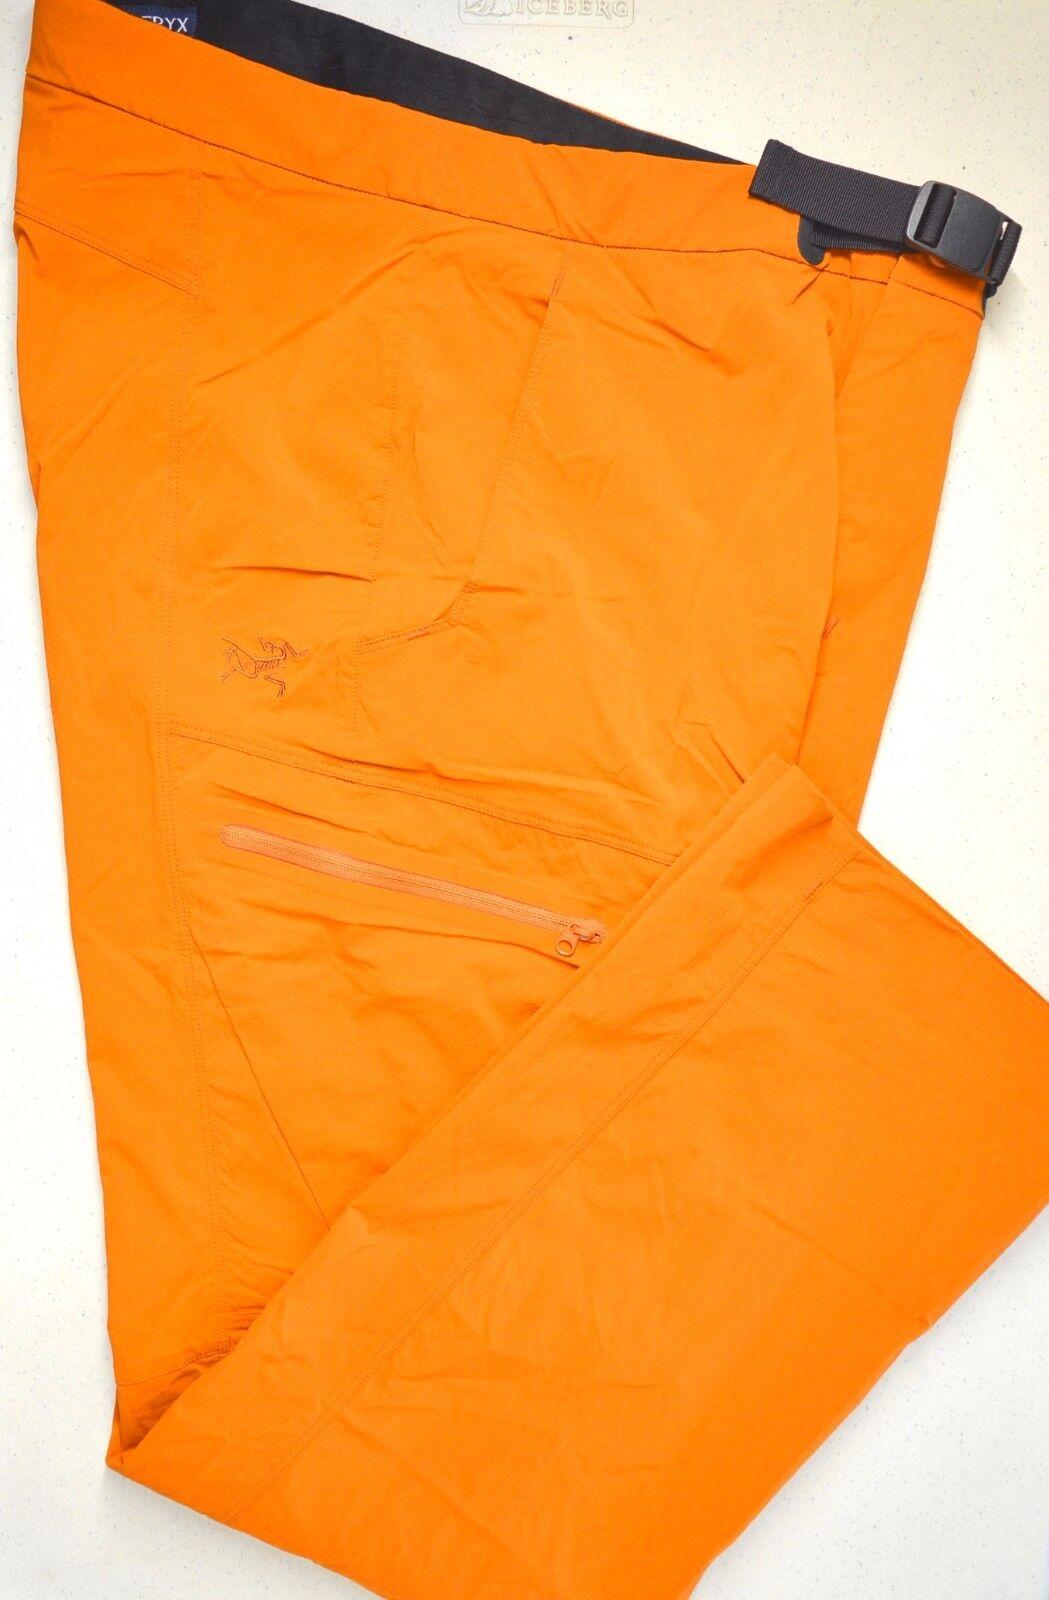 ARC'TERYX Palisade Lightweight Water Repellant Men's Pants Umber 34W X 32